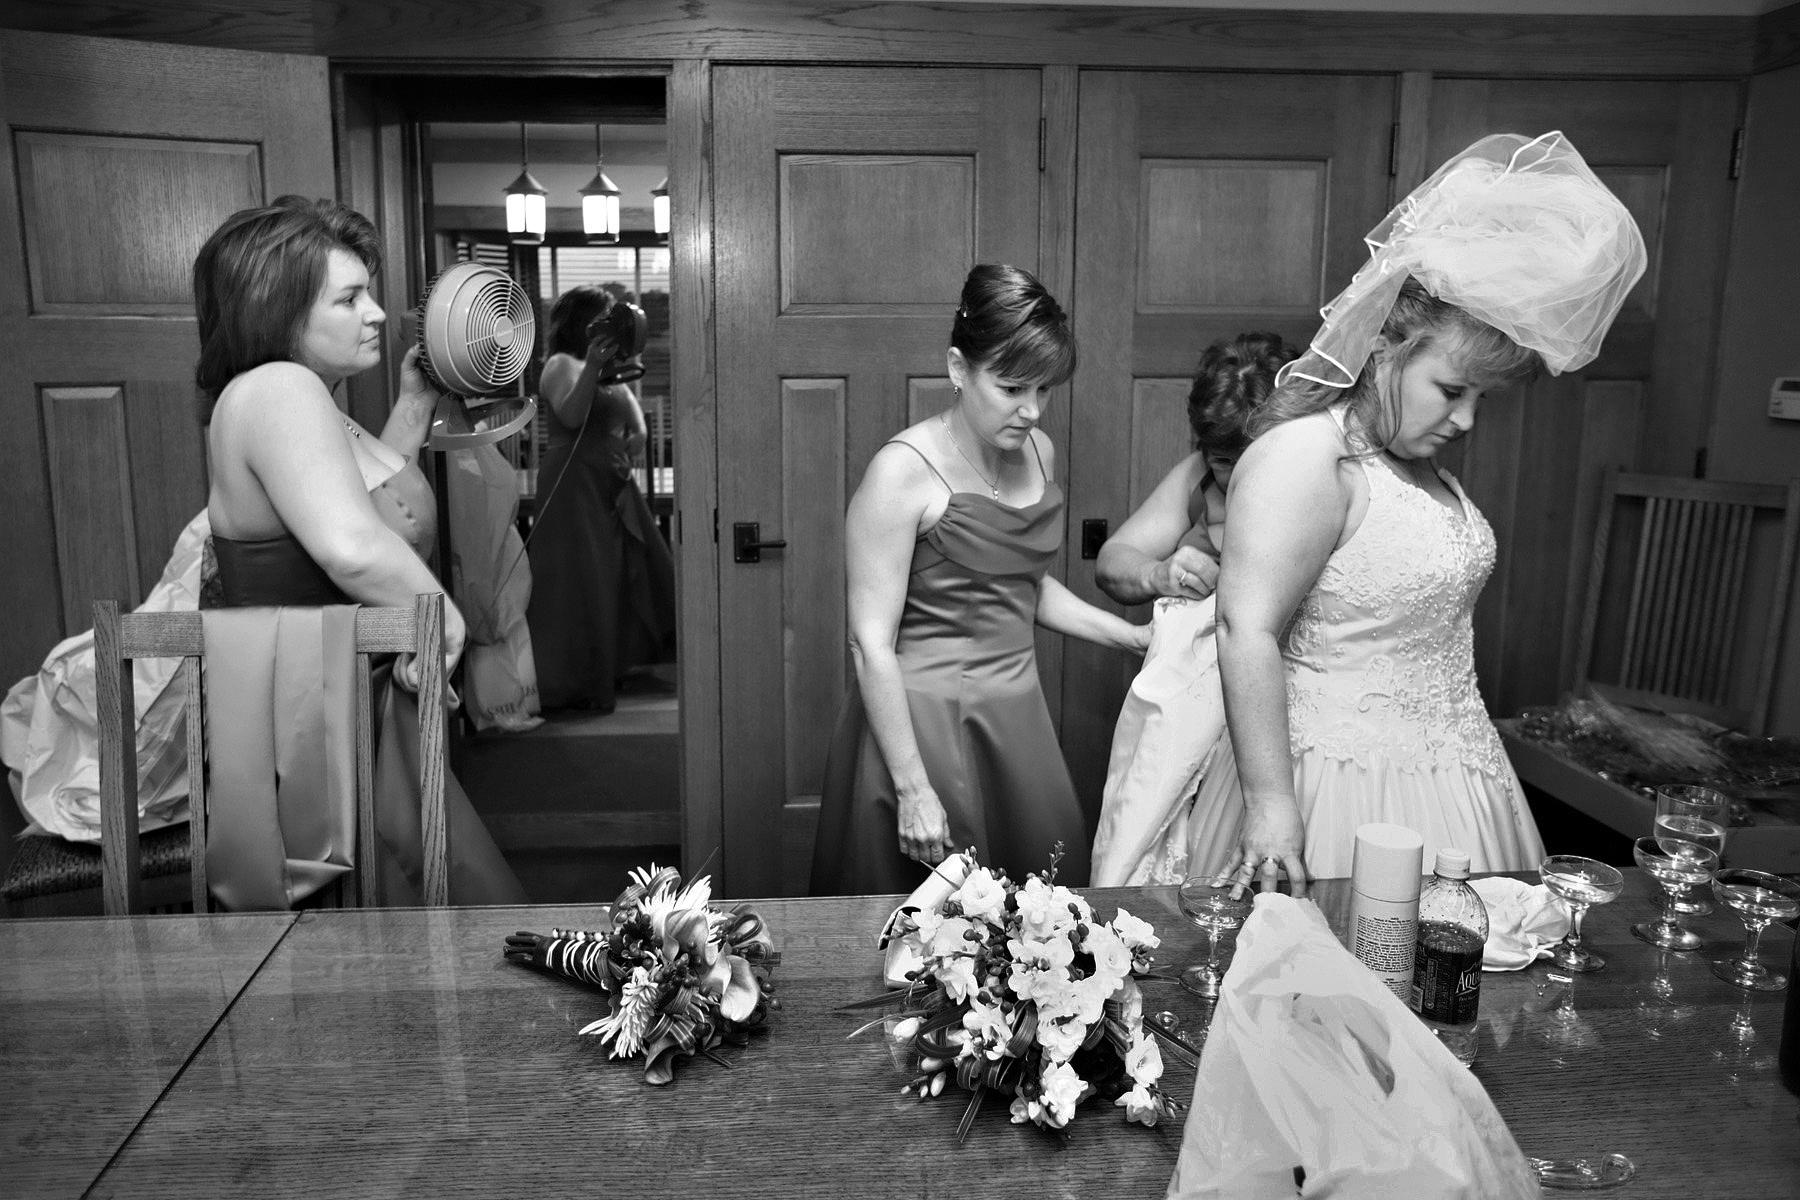 minneapolis-wedding-photography-mark-kegans-341.jpg